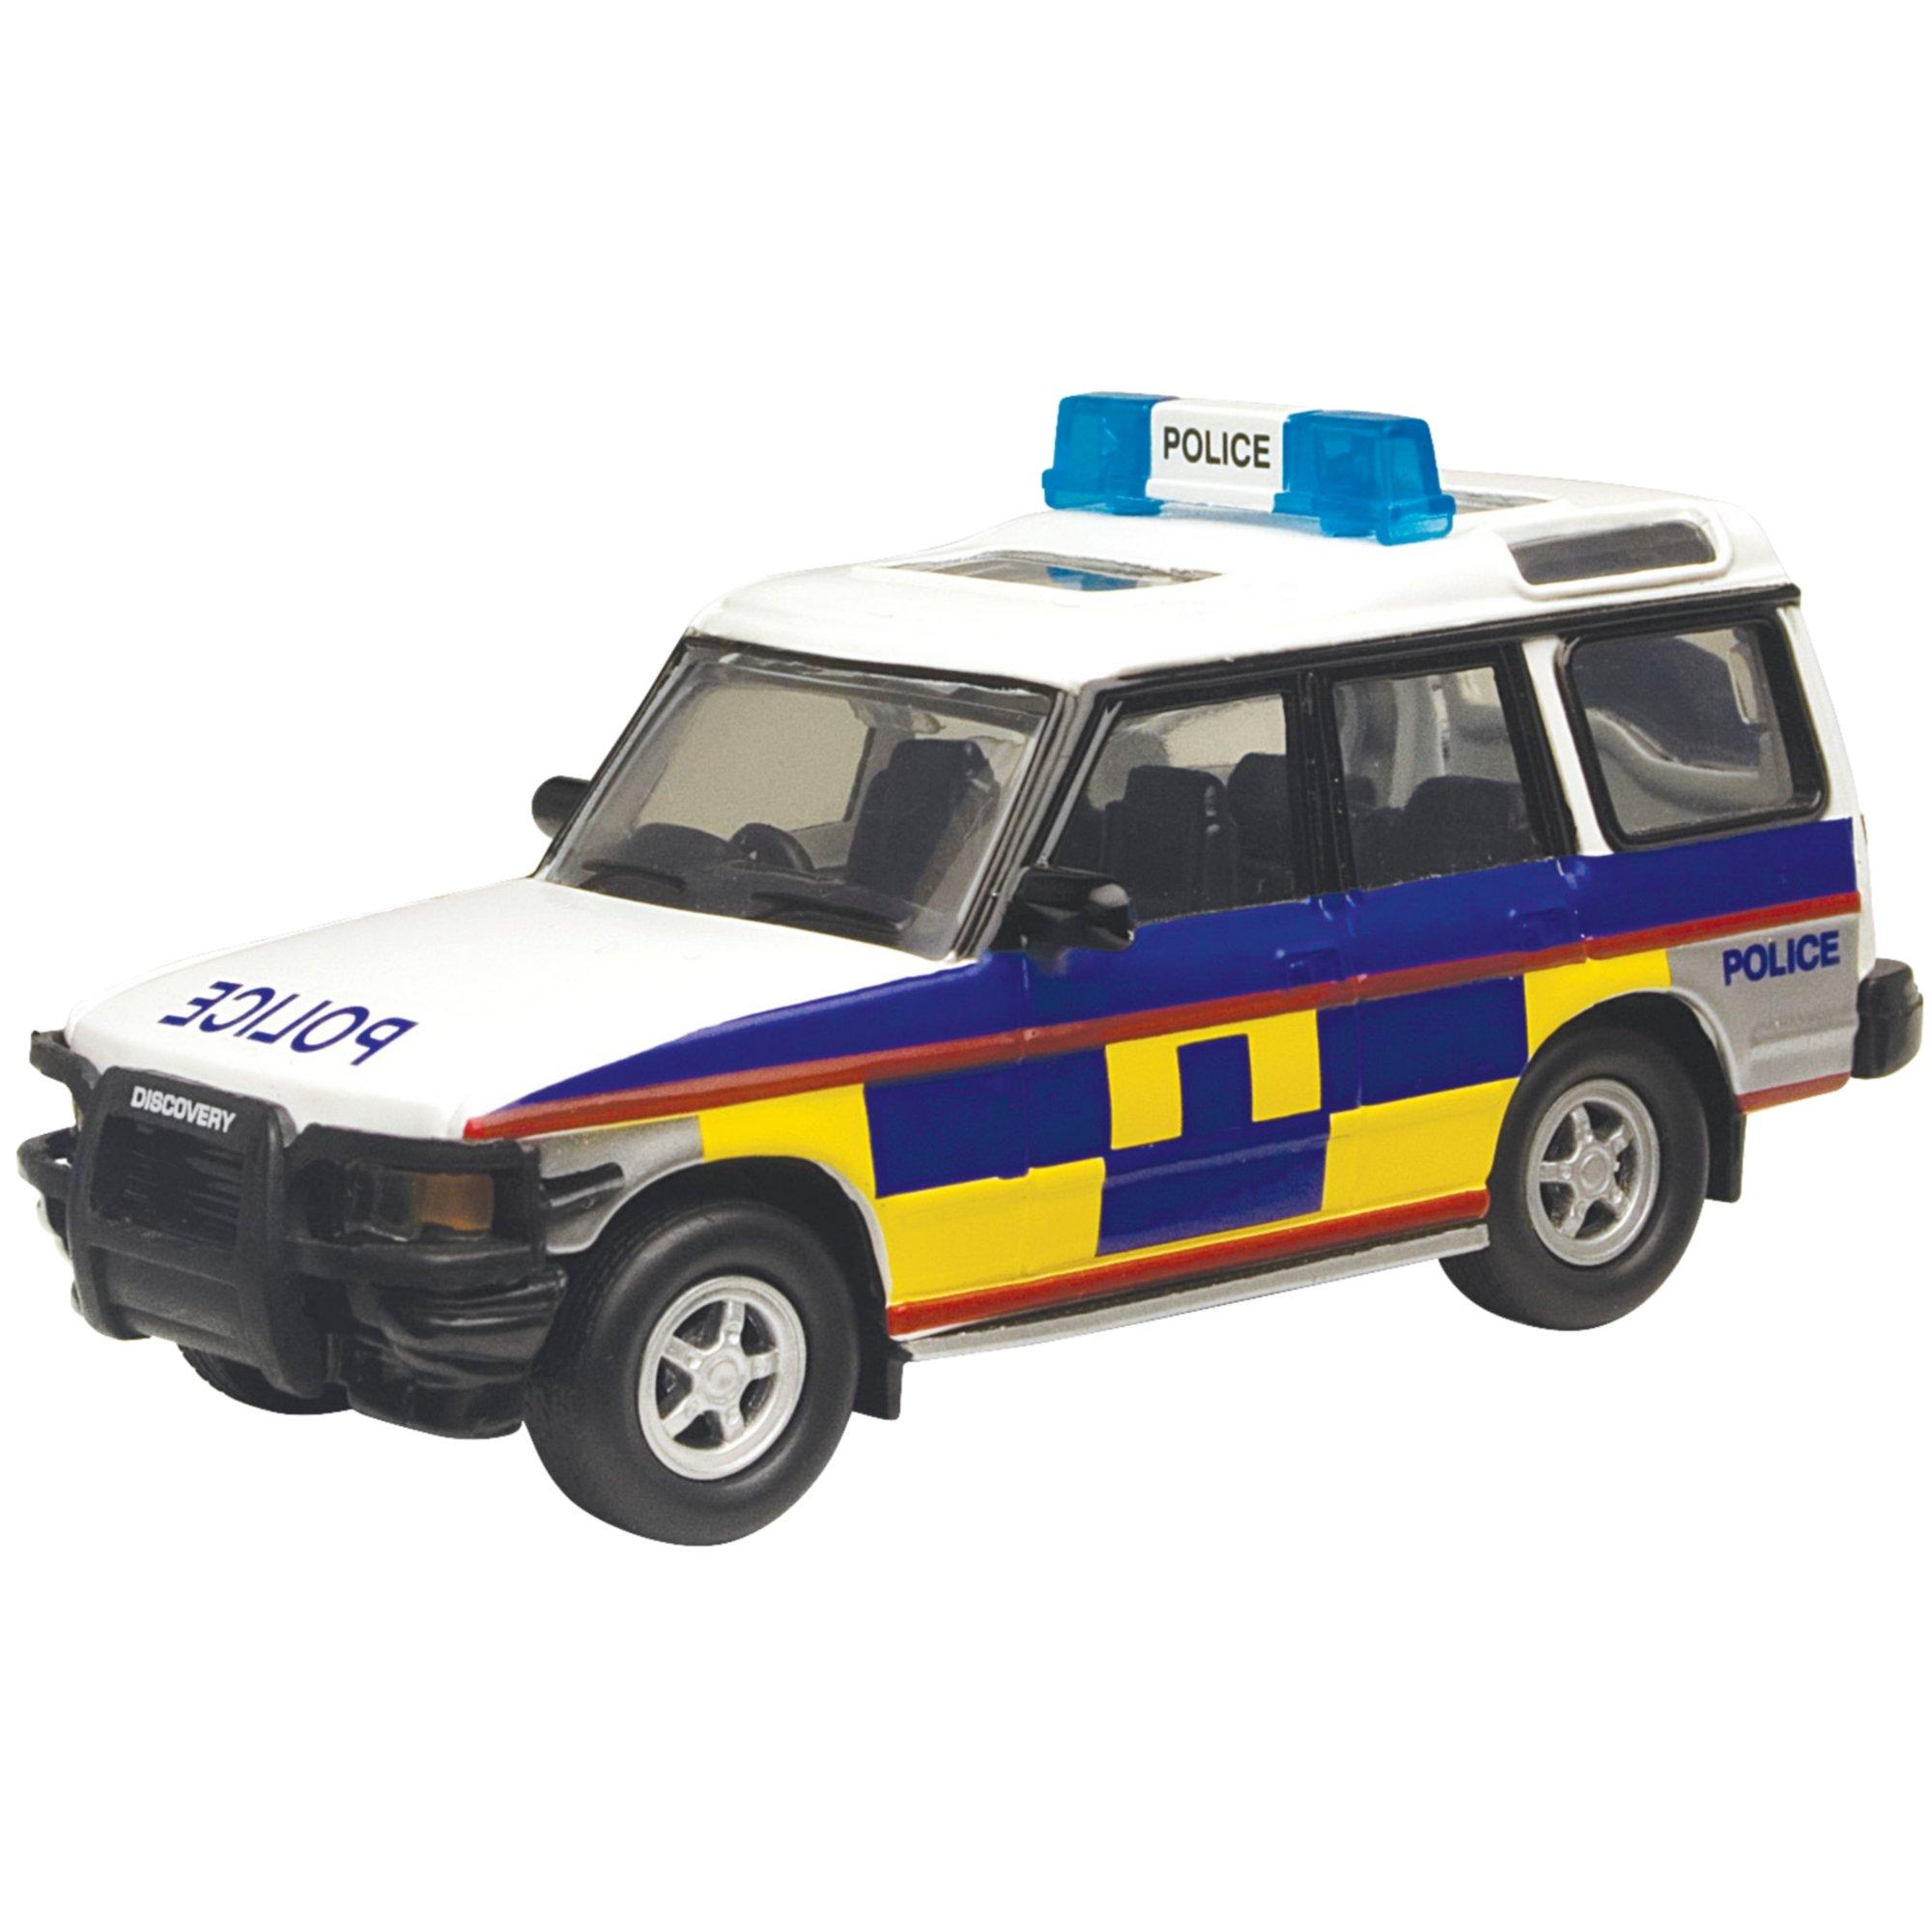 Hamleys Police Truck Toy (B00261QK64) Amazon Price History, Amazon Price Tracker